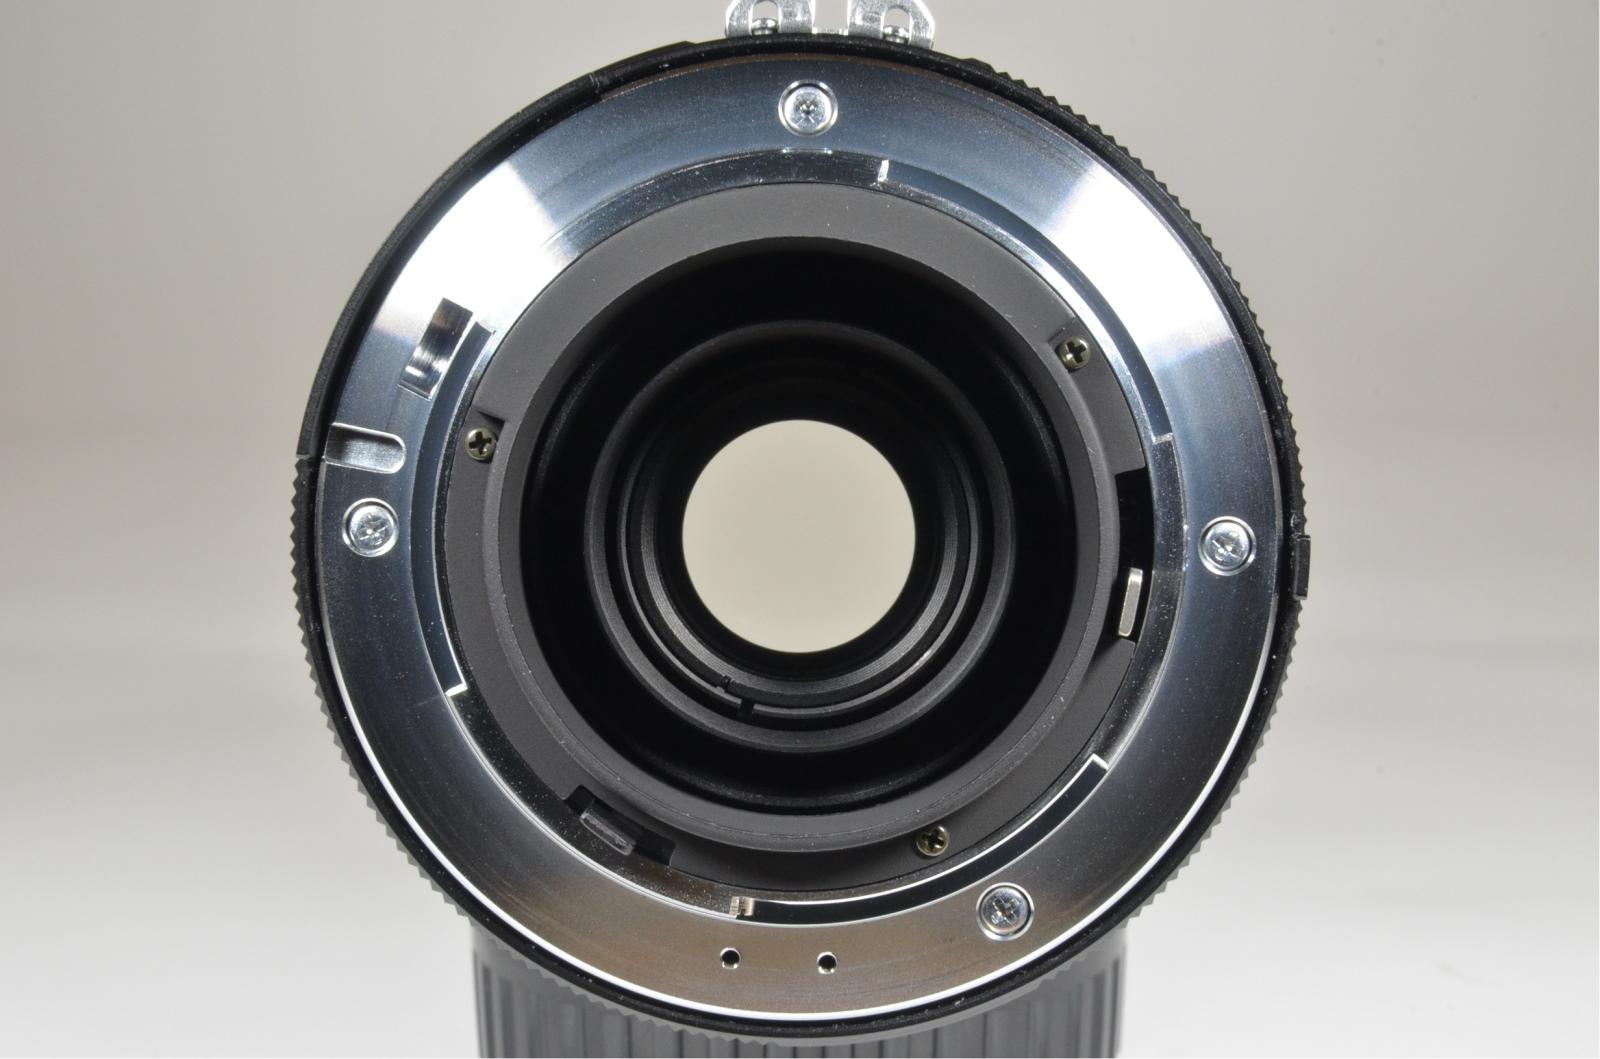 voigtlander apo-lanthar 180mm f/4 sl for ai-s nikon in boxed